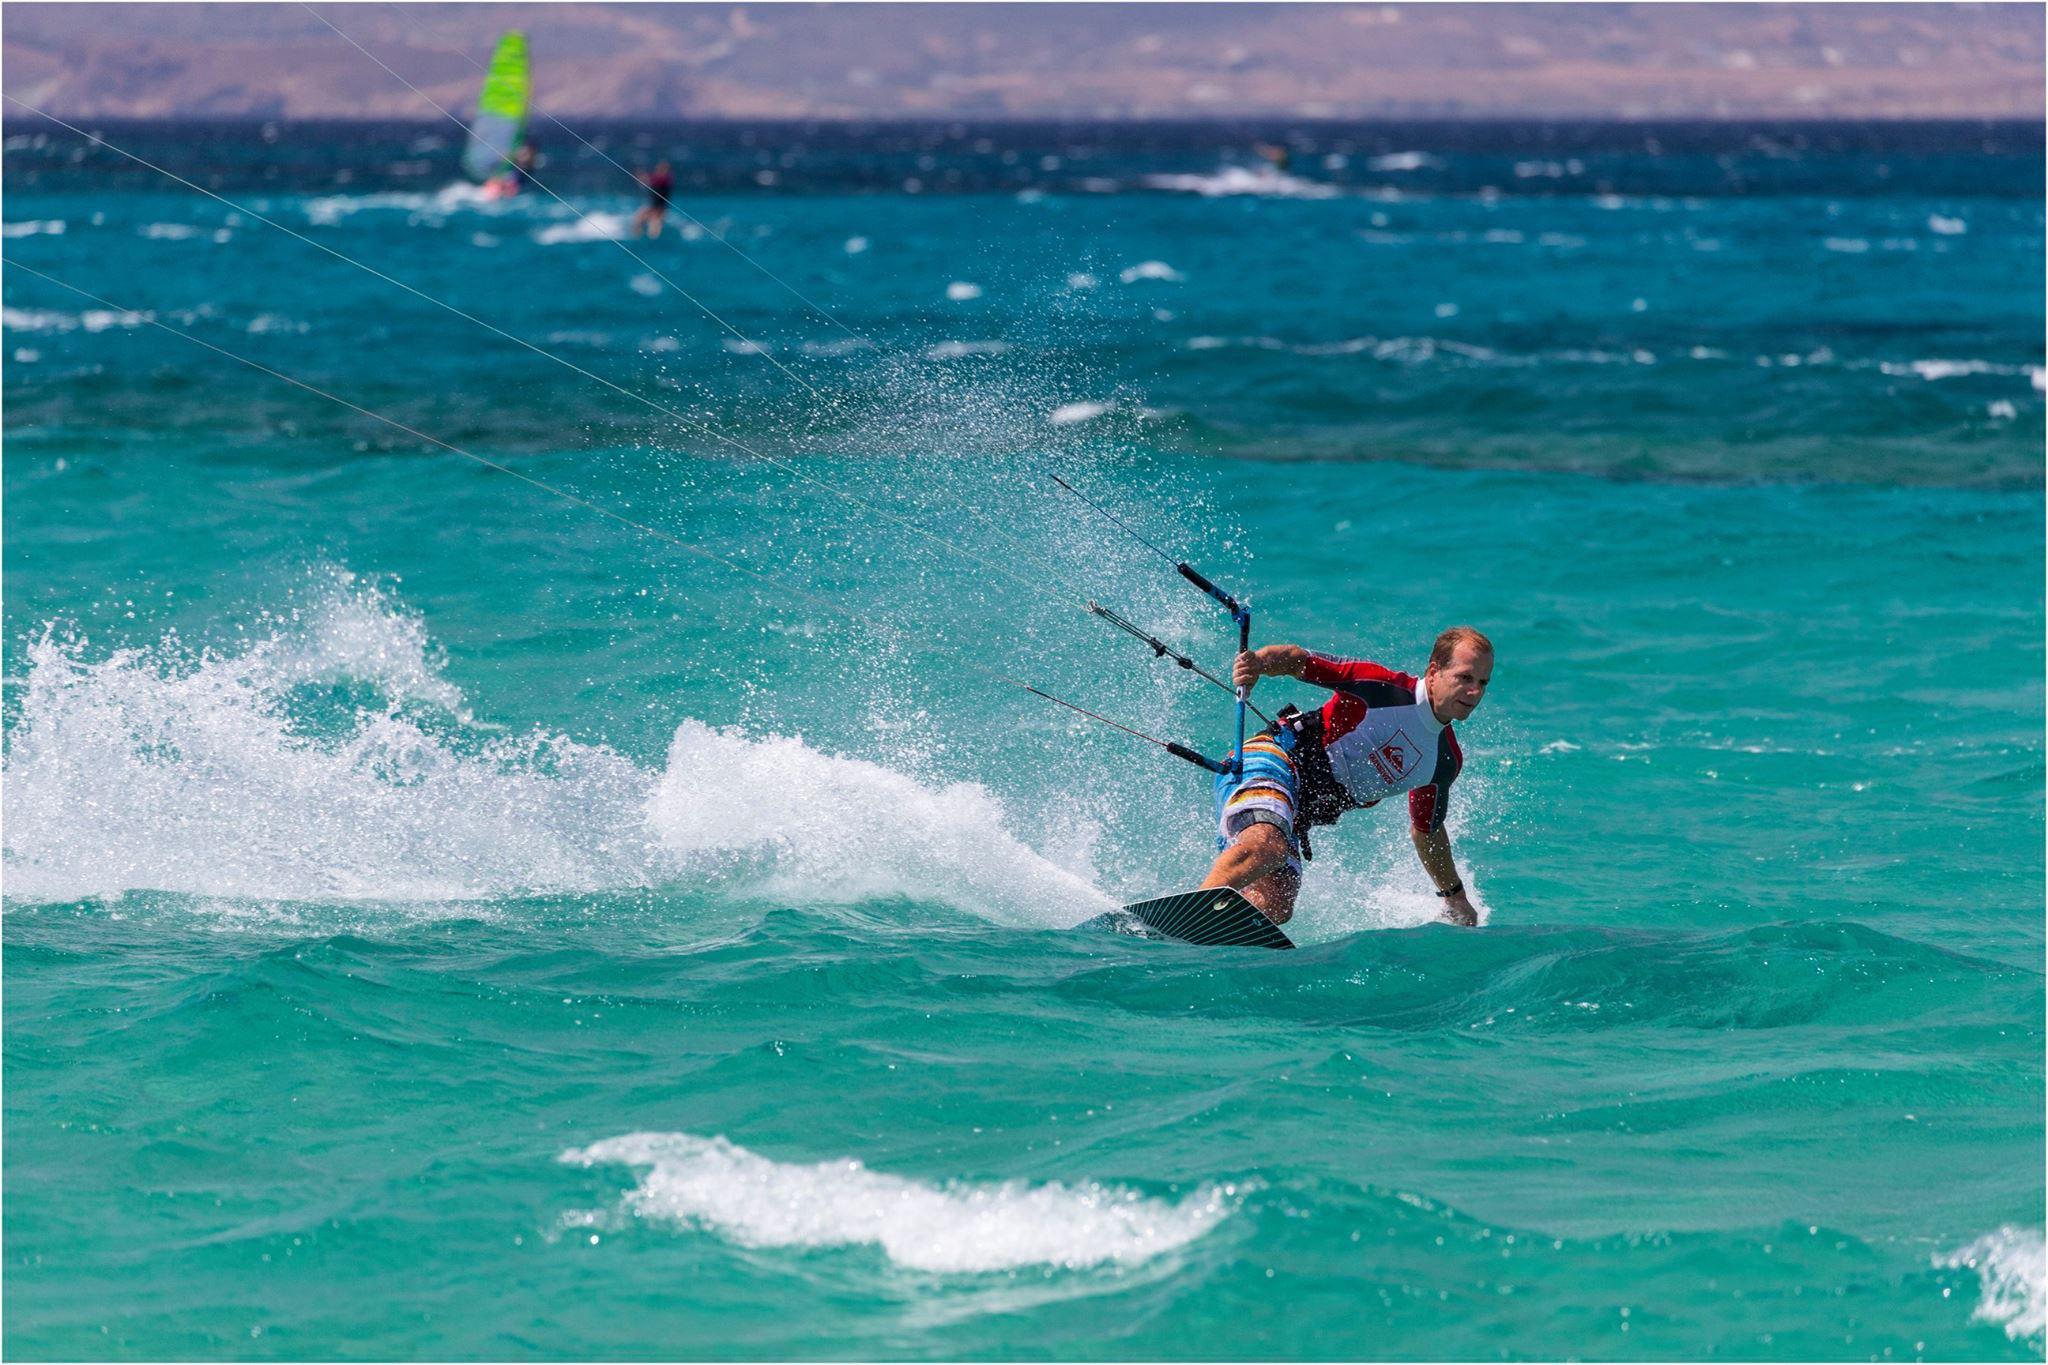 Naxos Island | Kitesurfing Holidays and Travel Guides » Europe » Greece